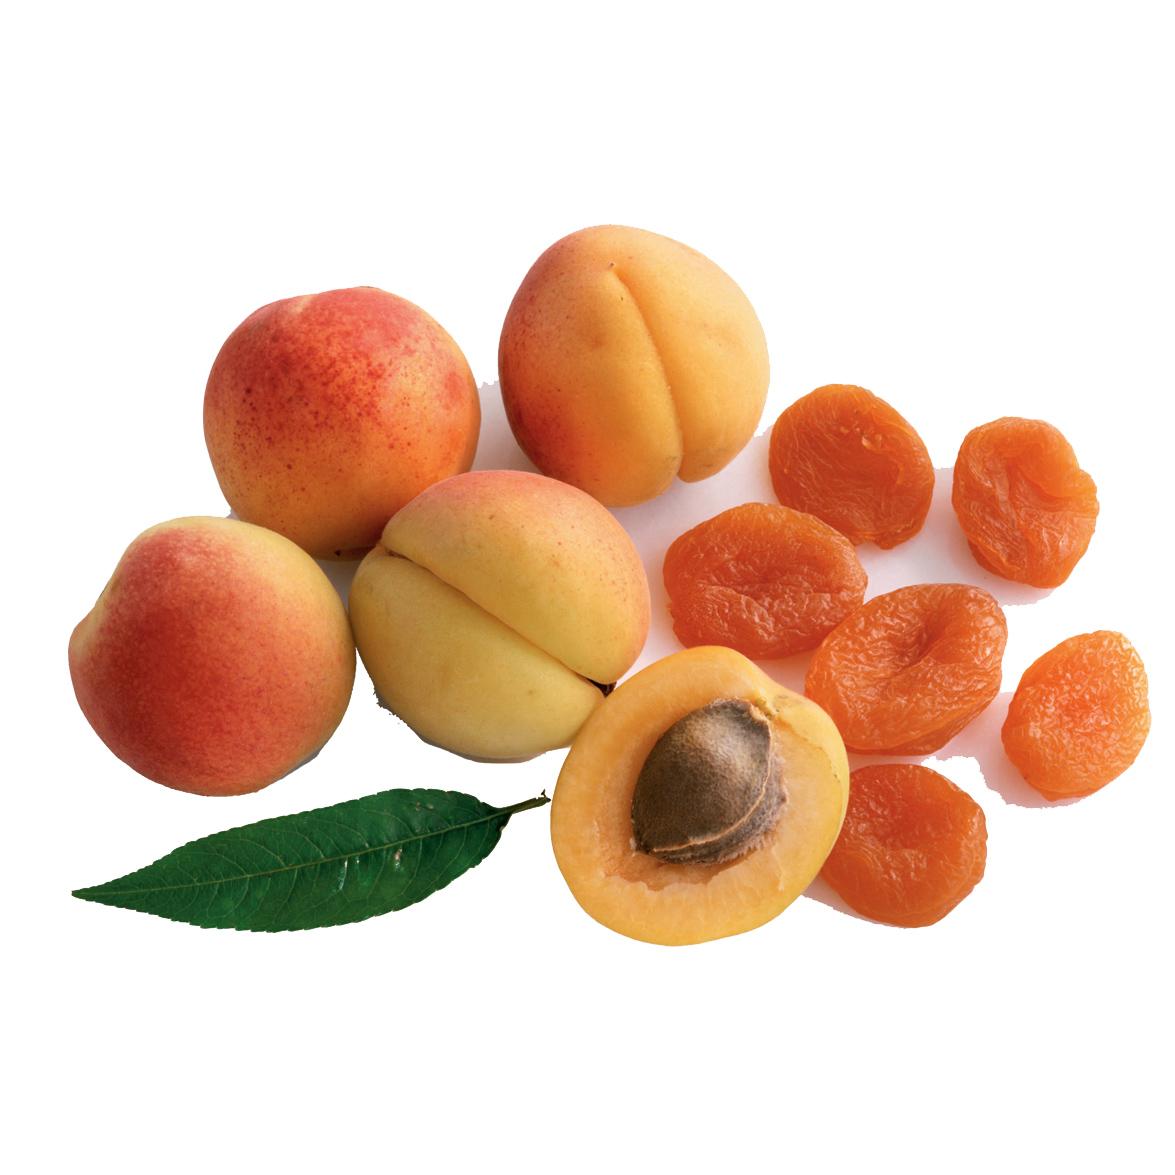 Dried apricots: half sun